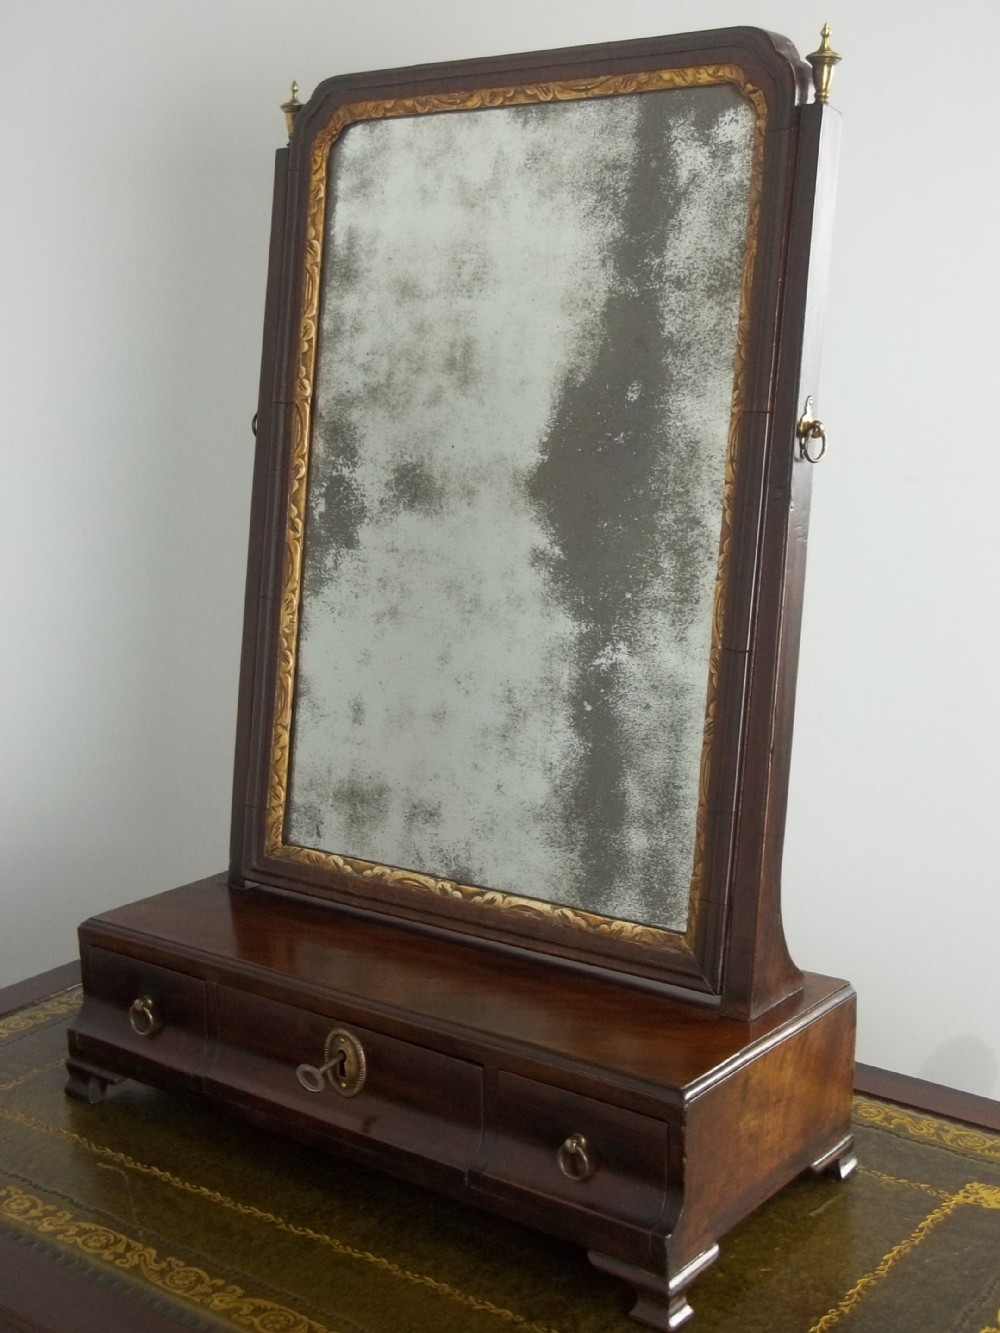 a george ii walnut 18th century georgian red walnut or mahogany dressing table toilet mirror c1750